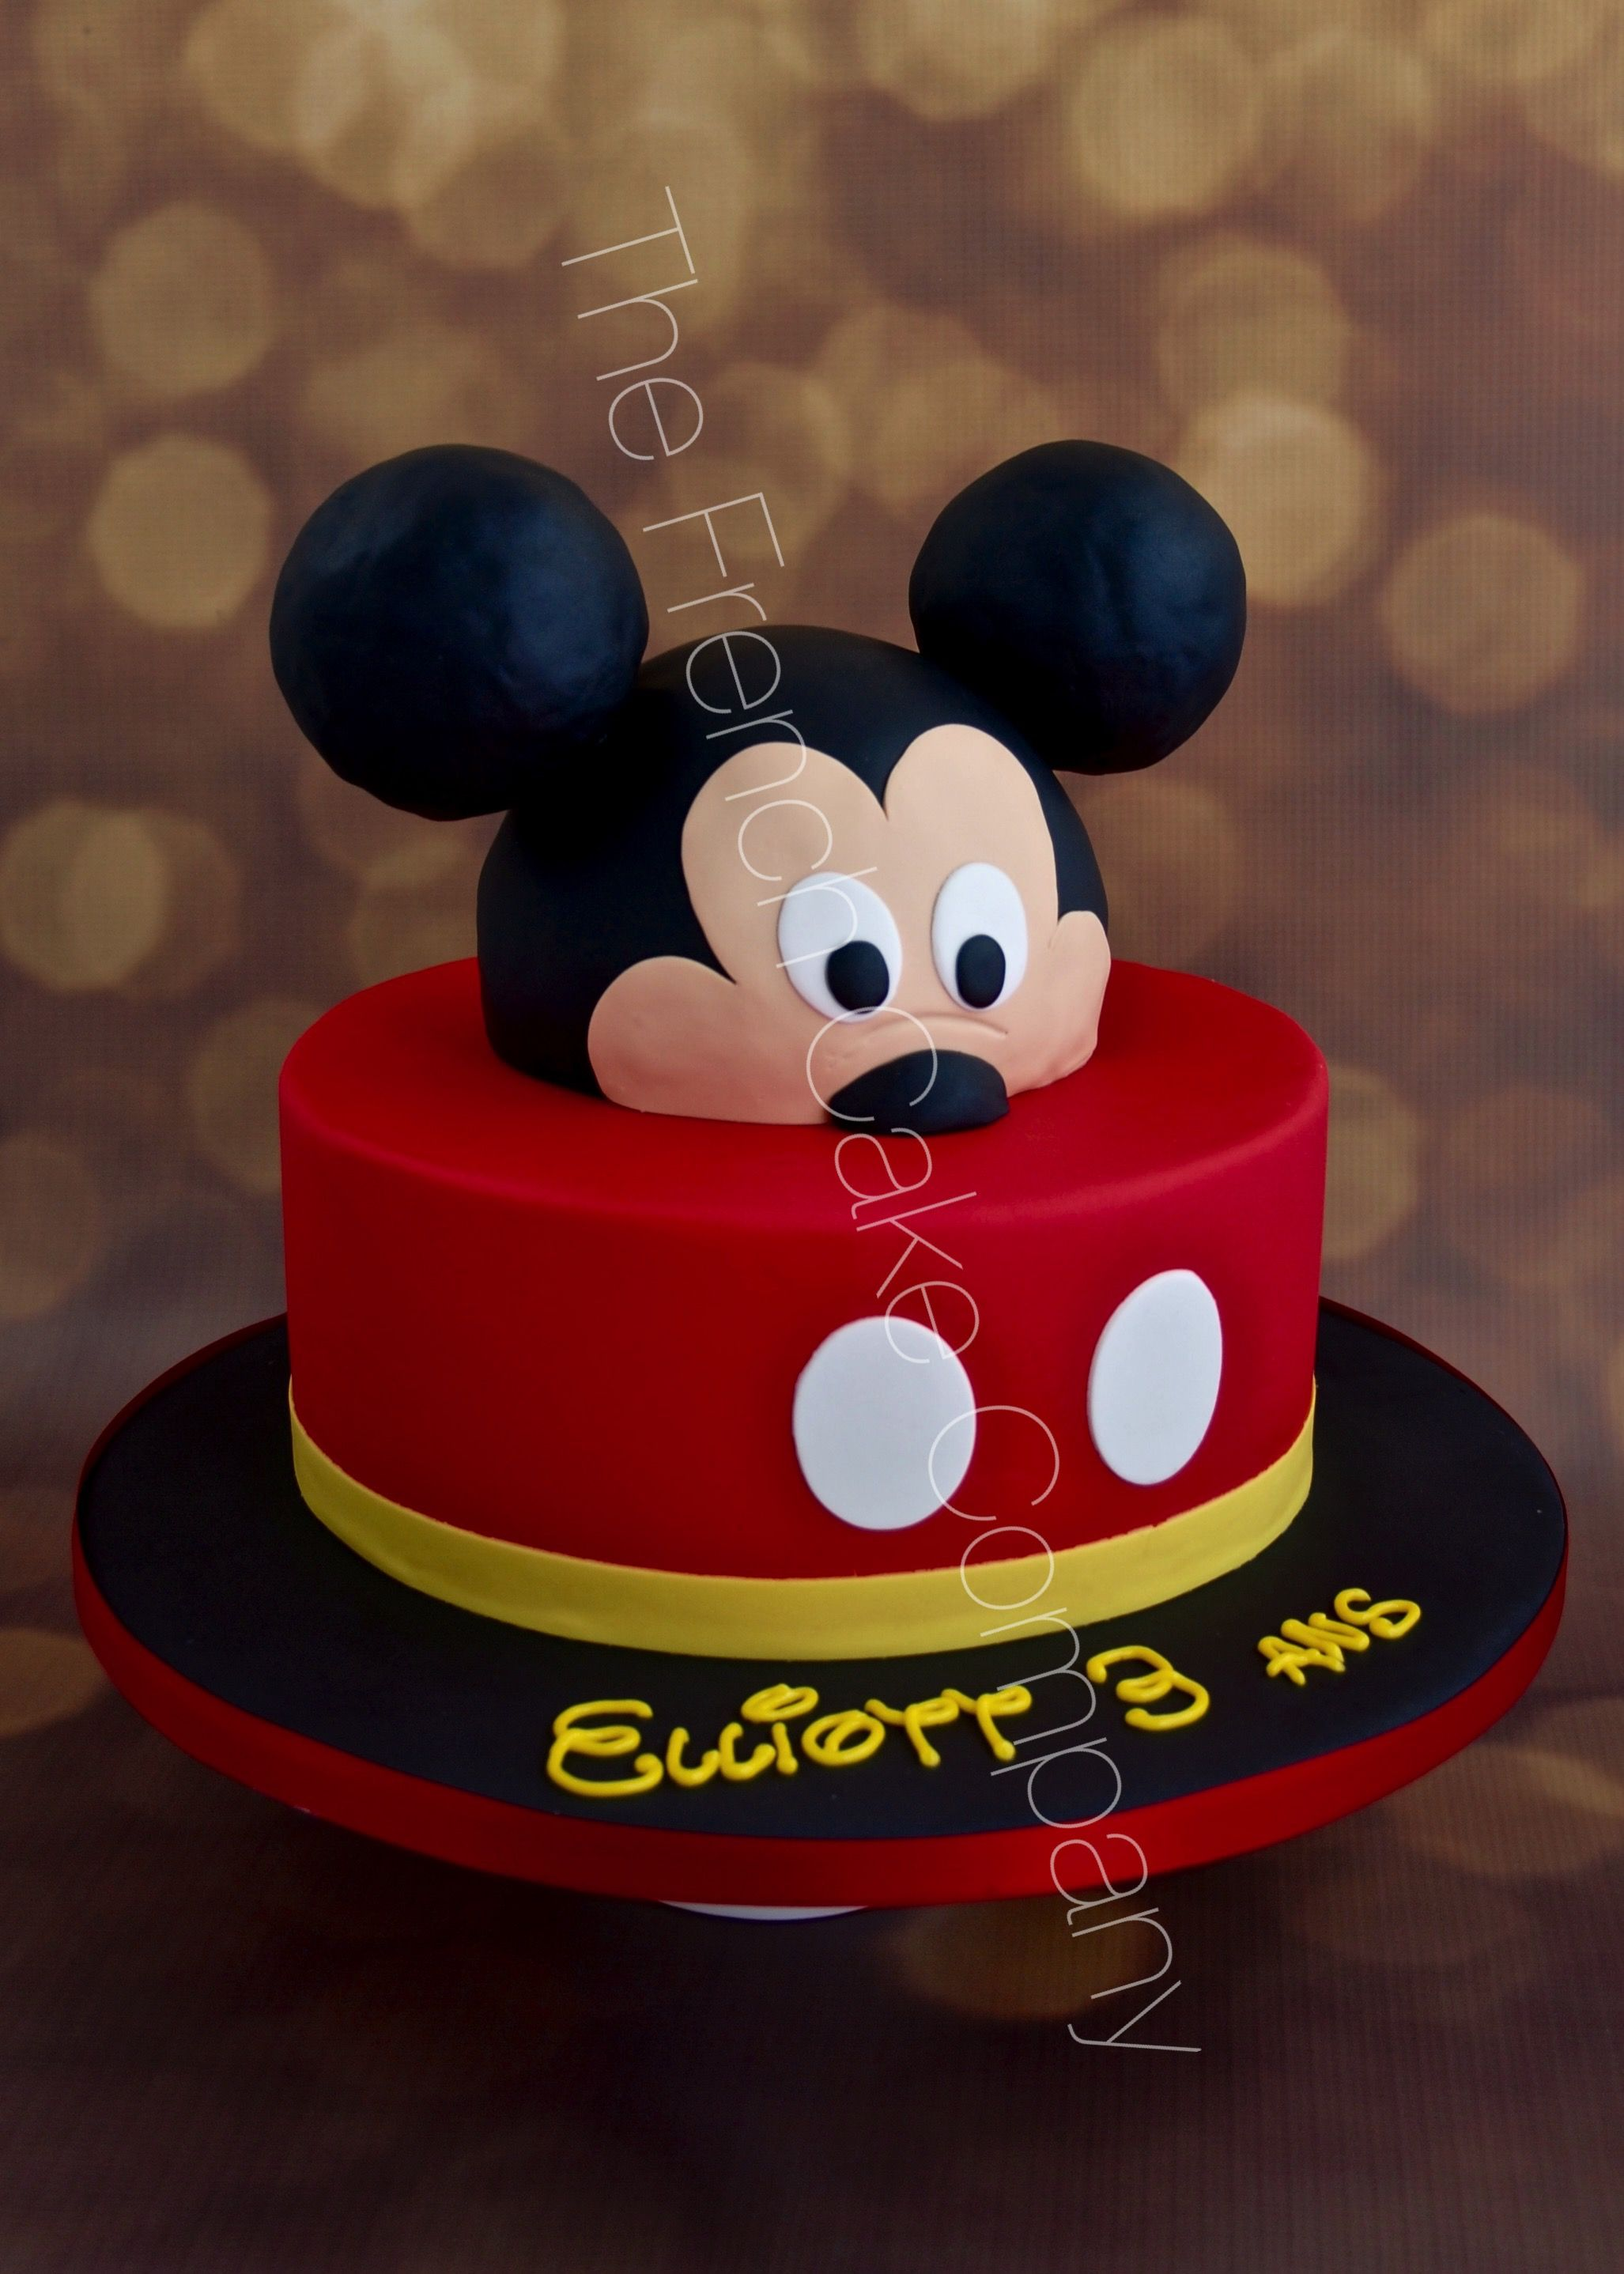 g teau d 39 anniversaire mickey cake design belgique mickey minnie cakes g teaux d. Black Bedroom Furniture Sets. Home Design Ideas